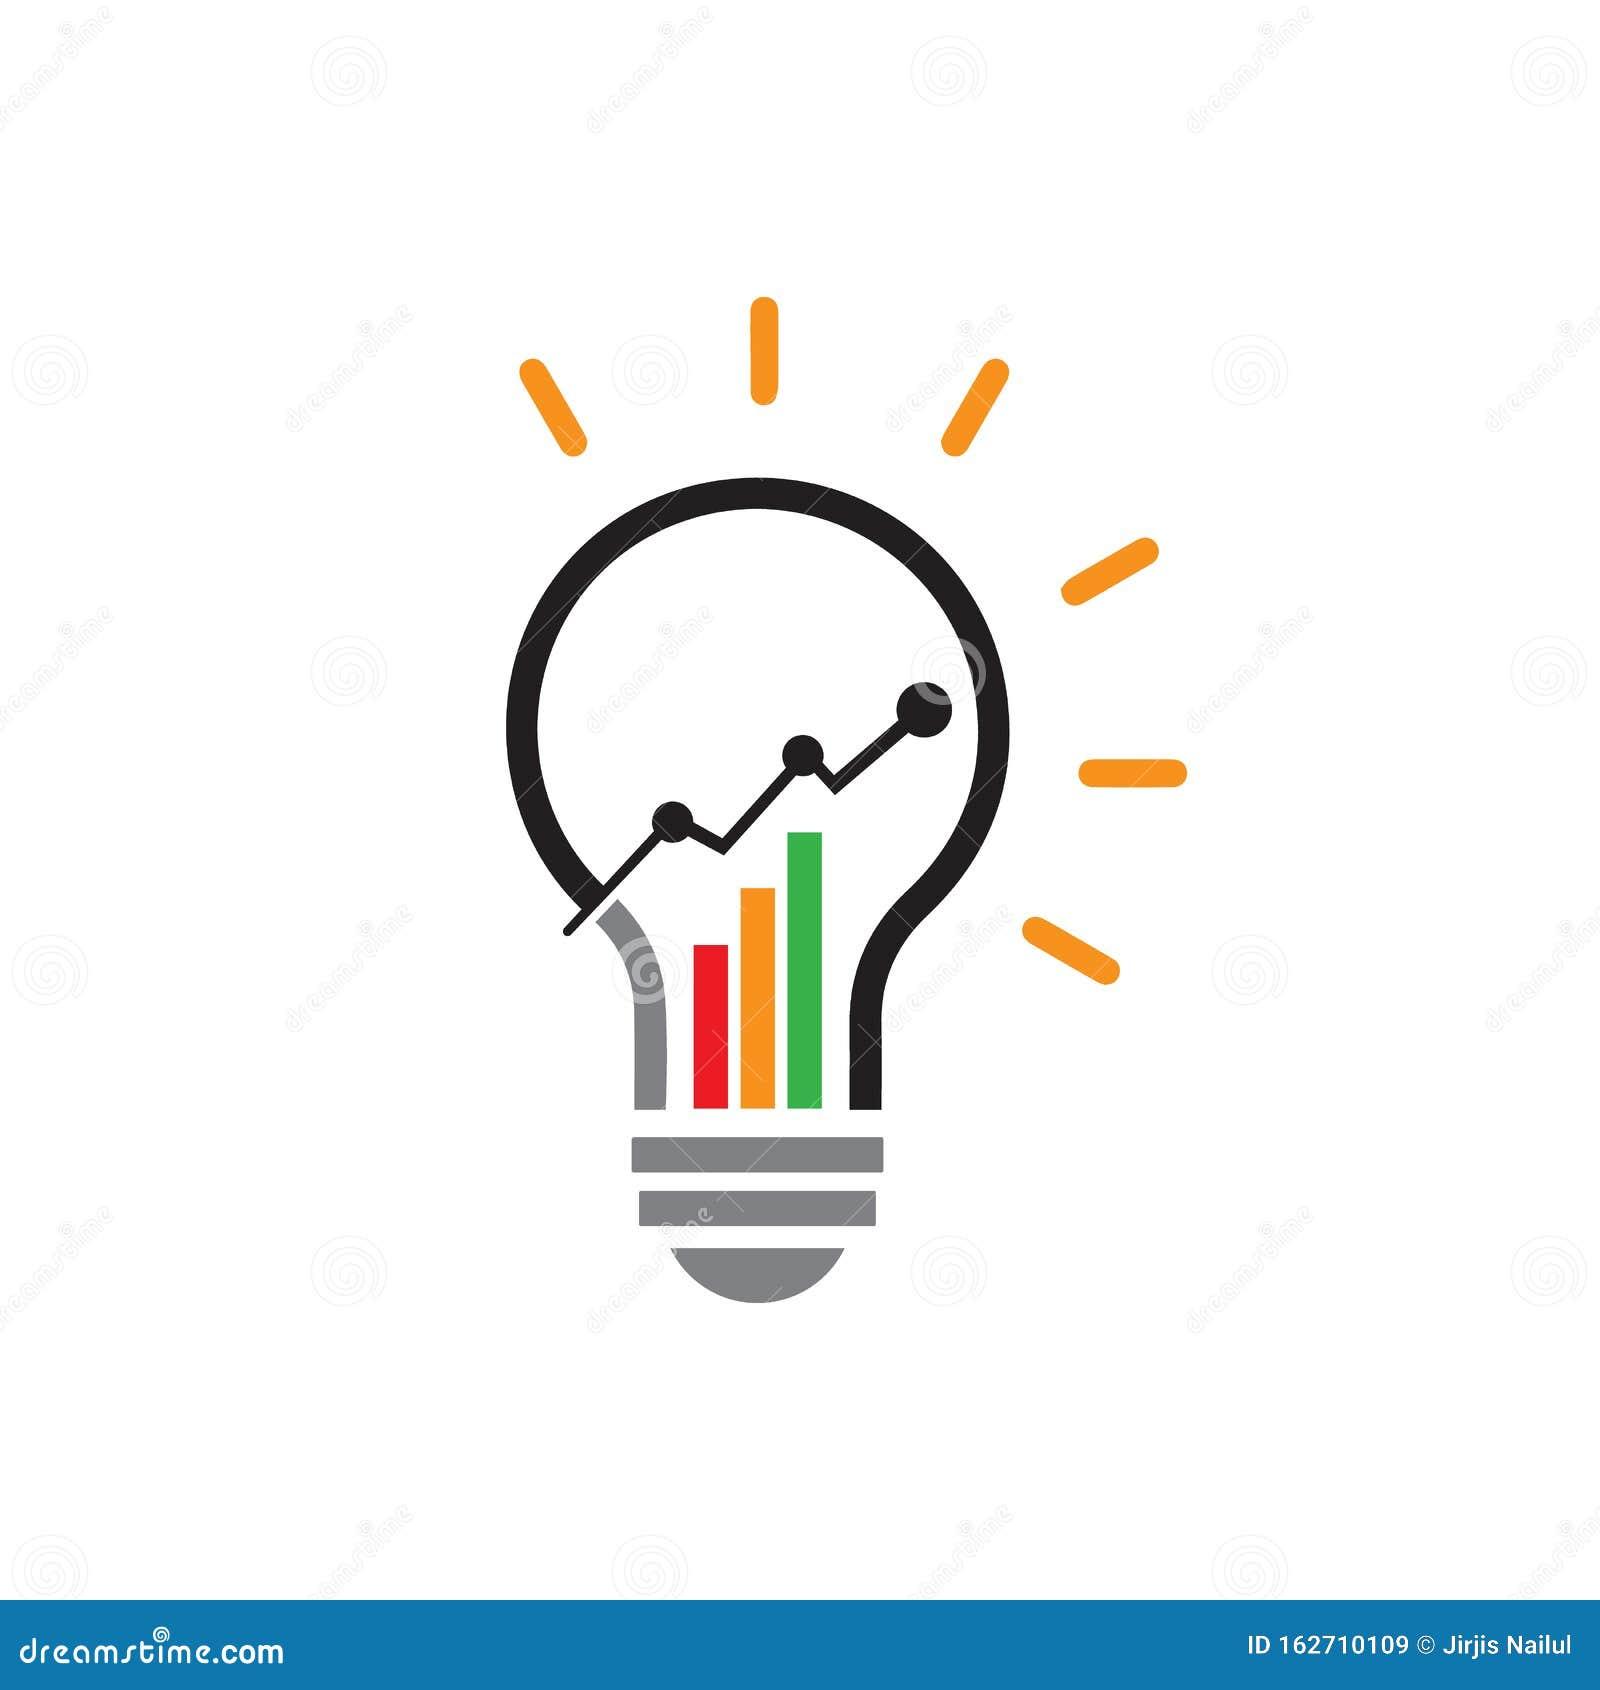 marketing finance sales economical business solutions logo